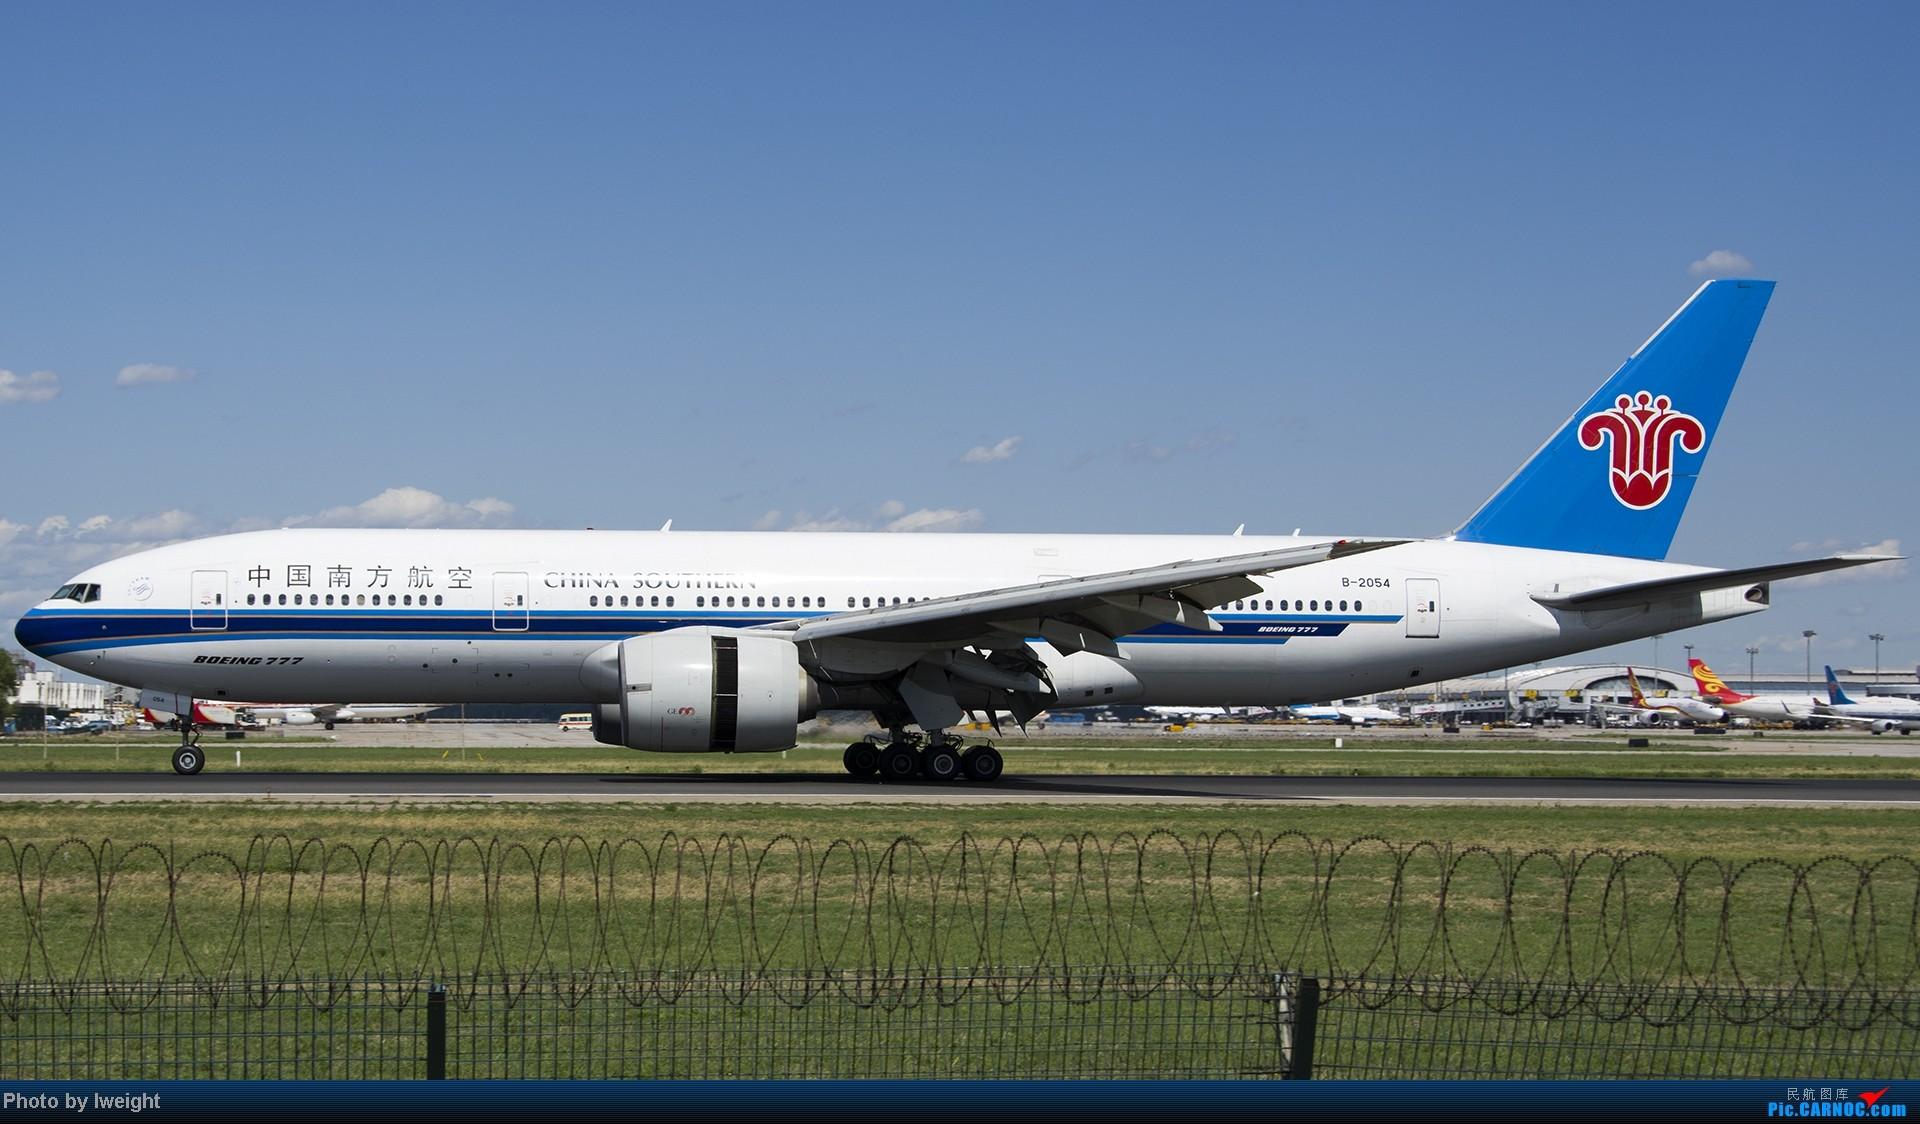 Re:[原创]新相机+好天气,PEK试机乱拍 BOEING 777-200 B-2054 中国北京首都机场